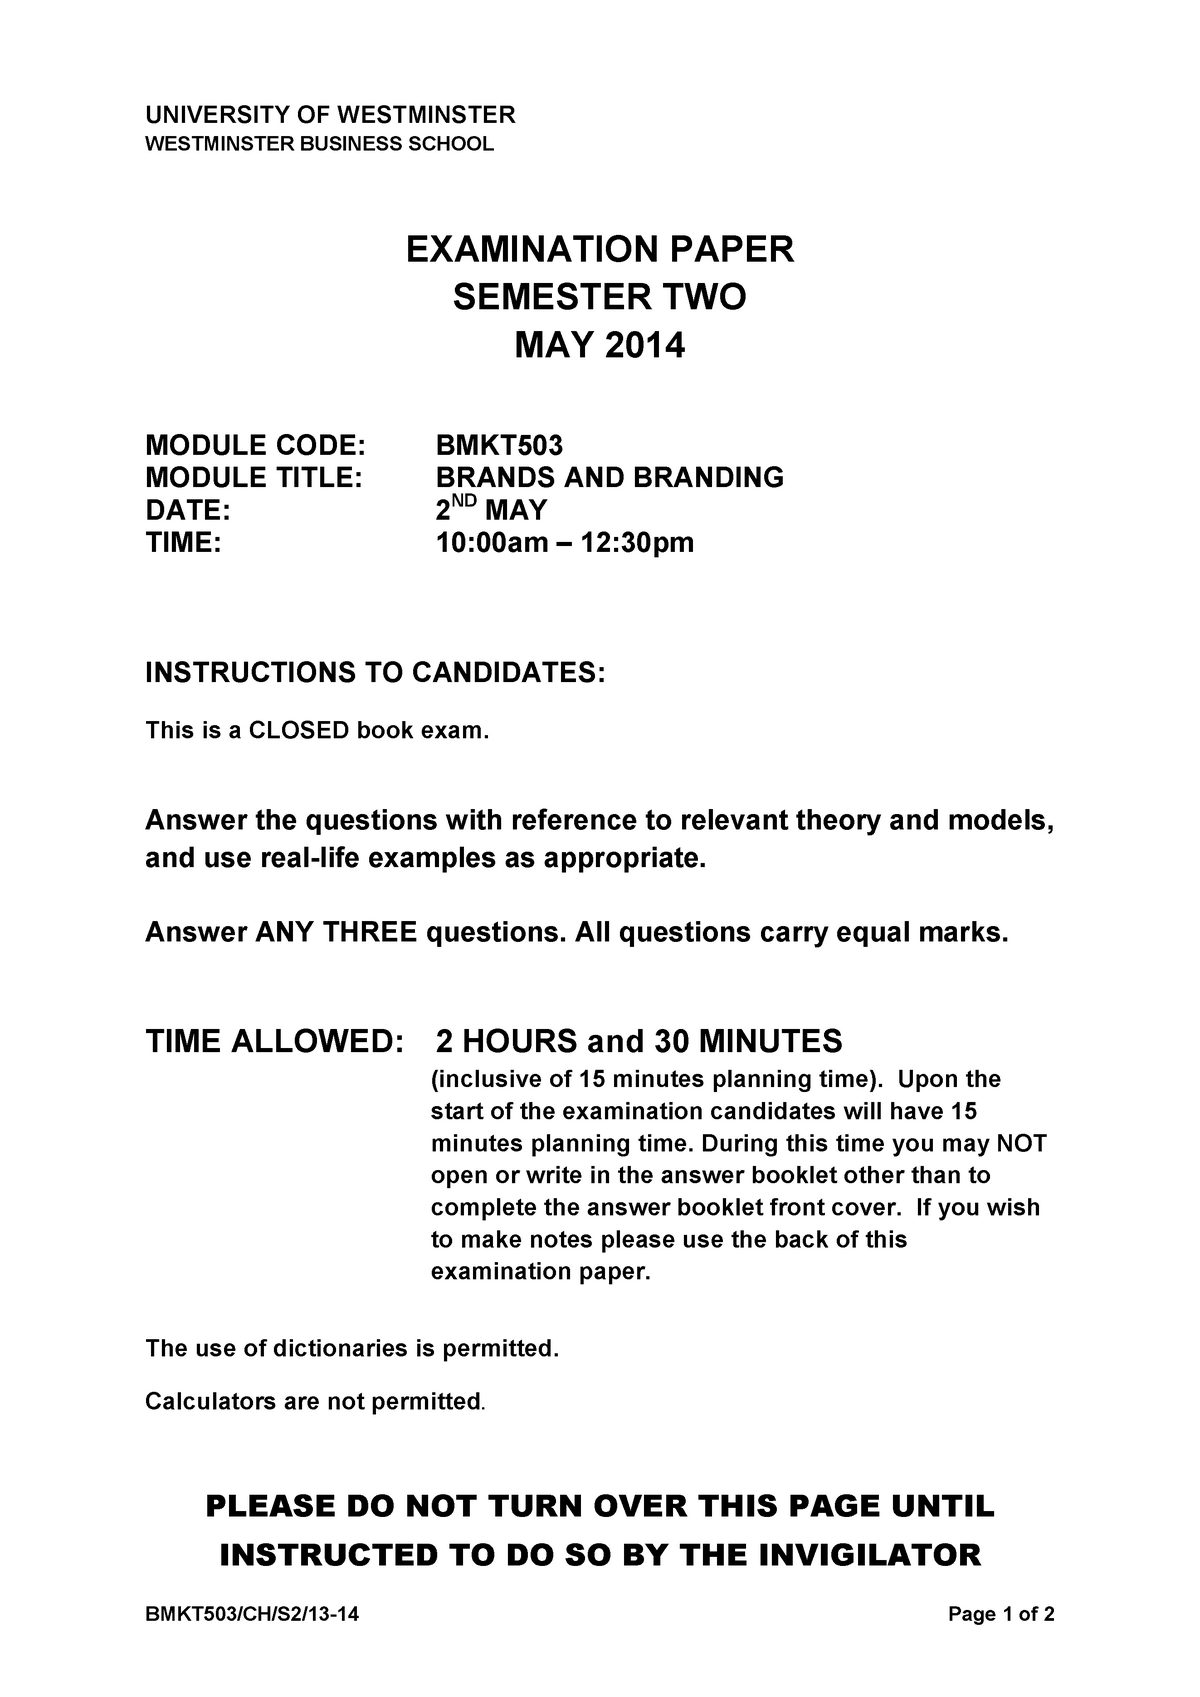 4b5c8765ed Exam 2014 - BMKT503: Brands and Branding - StuDocu